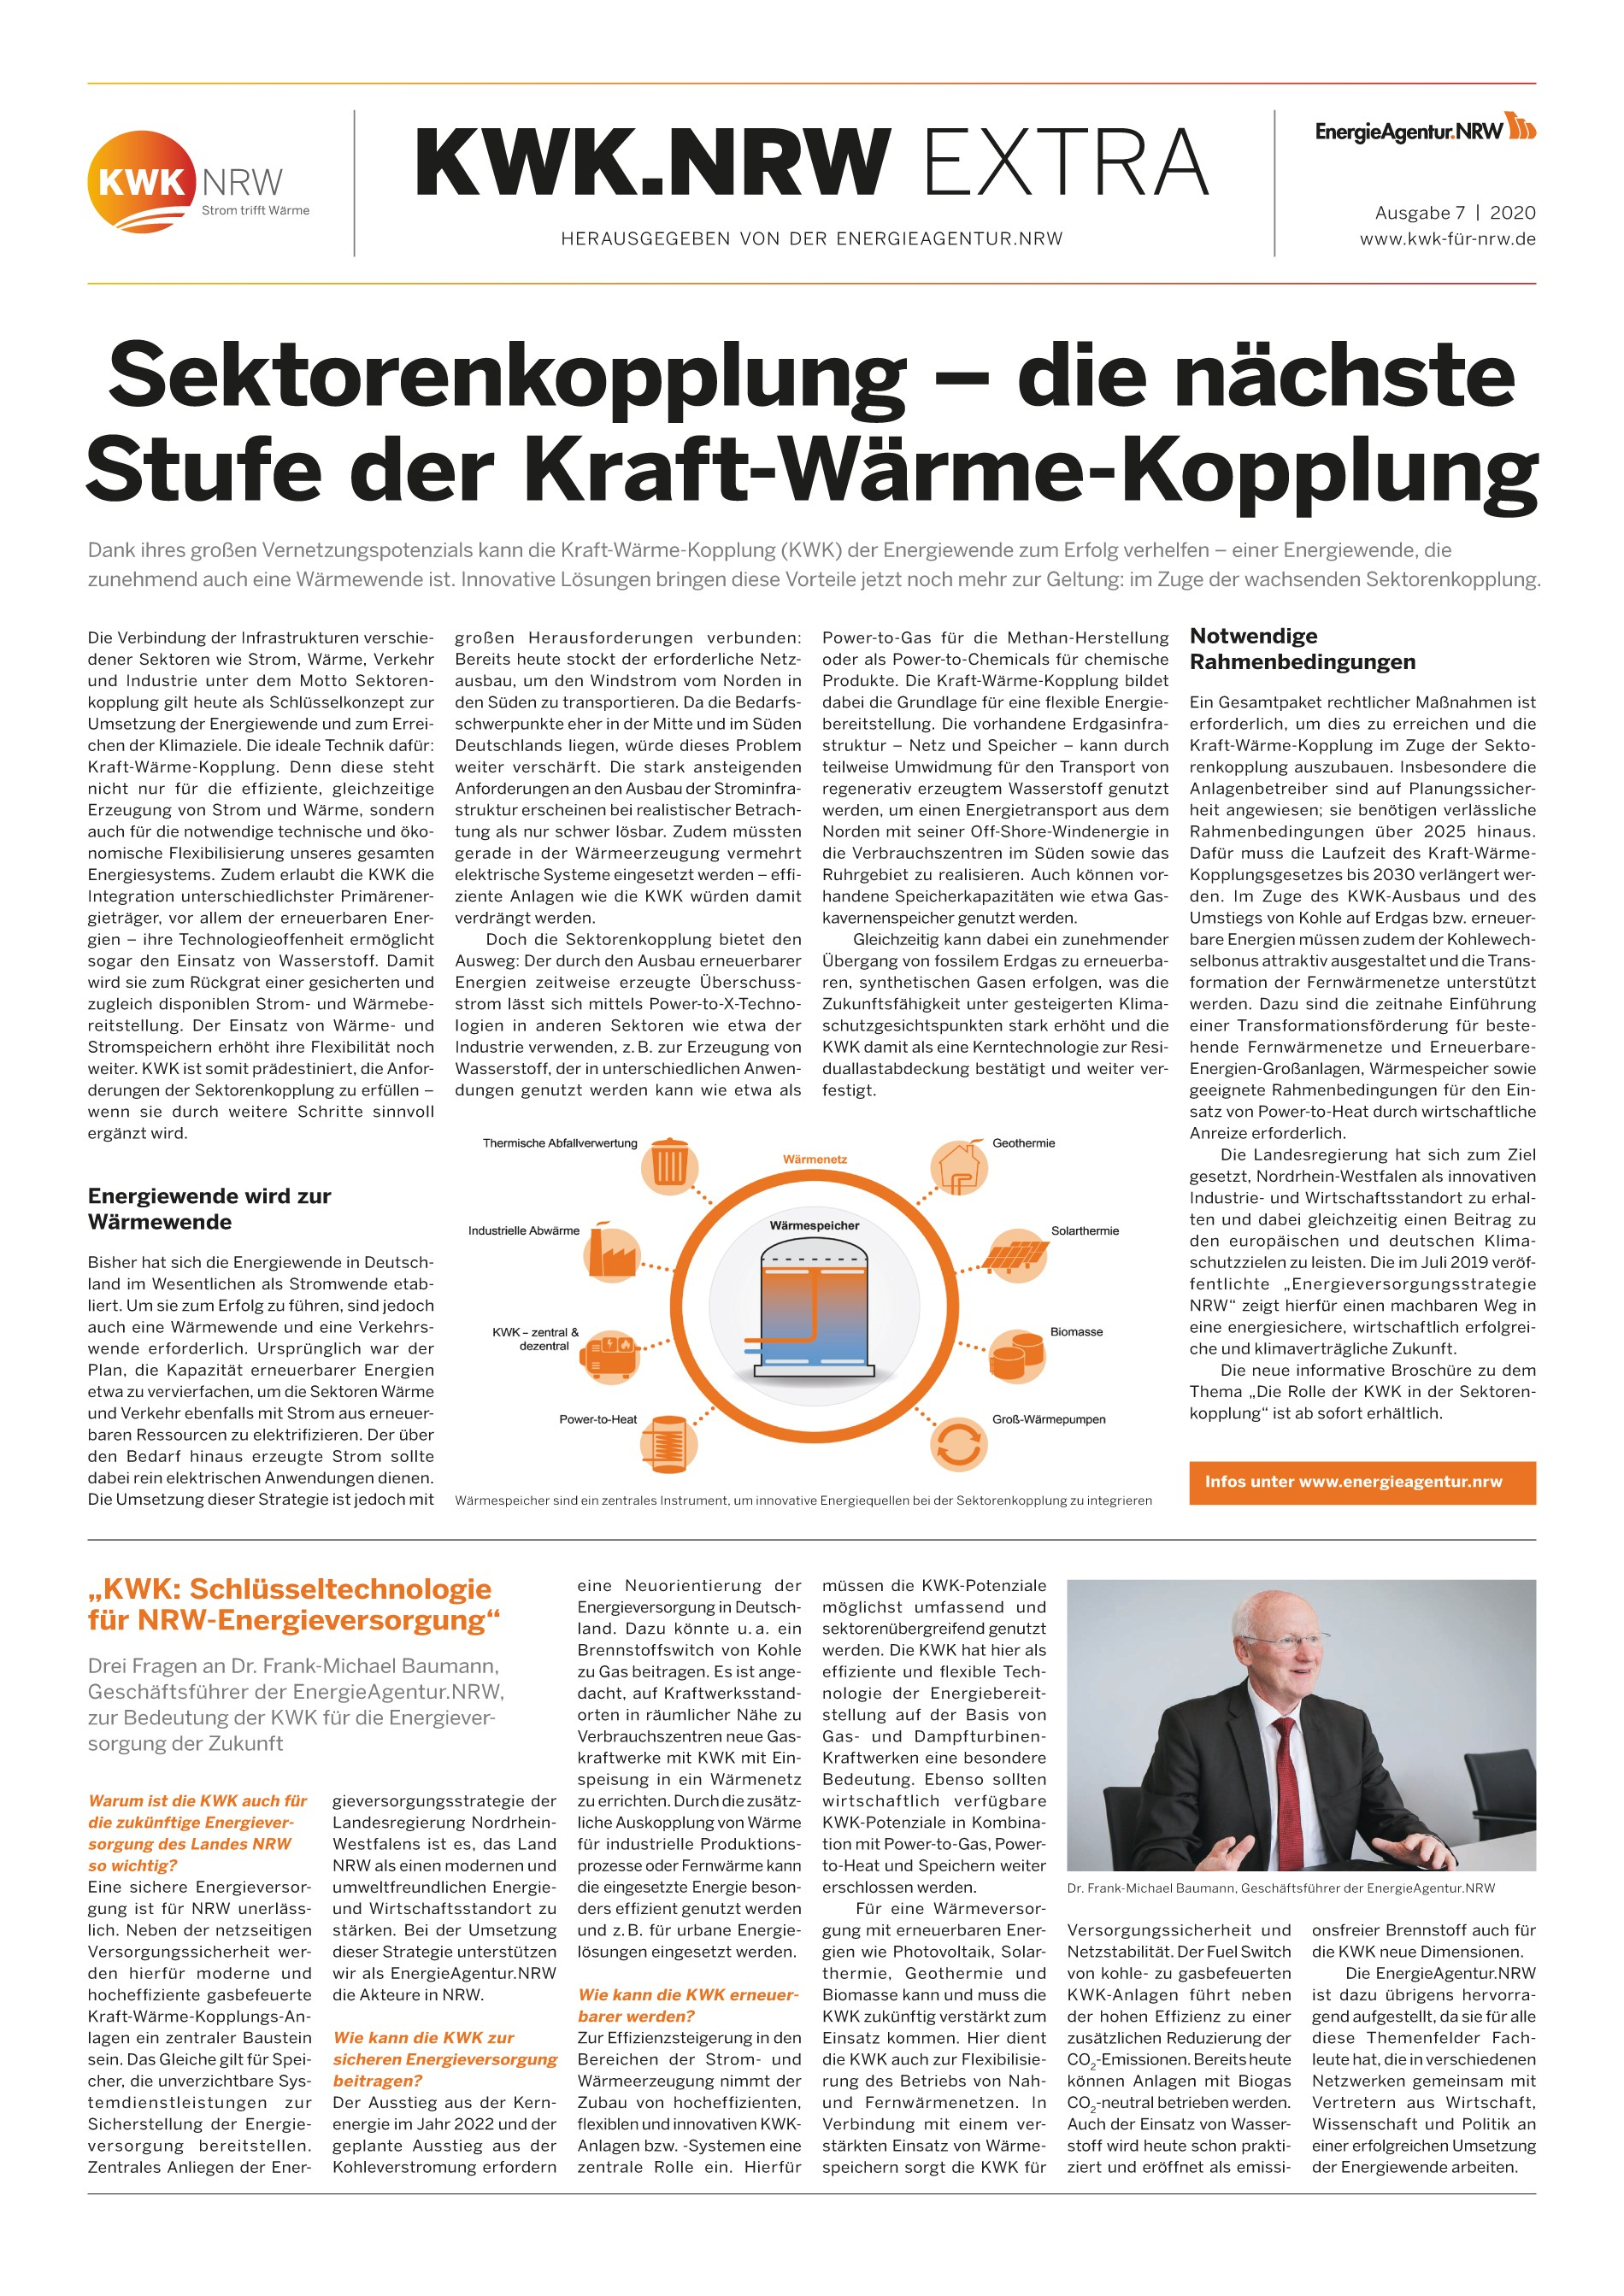 Themenblatt: Innovative Kraft-Wärme-Kopplungs-Systeme